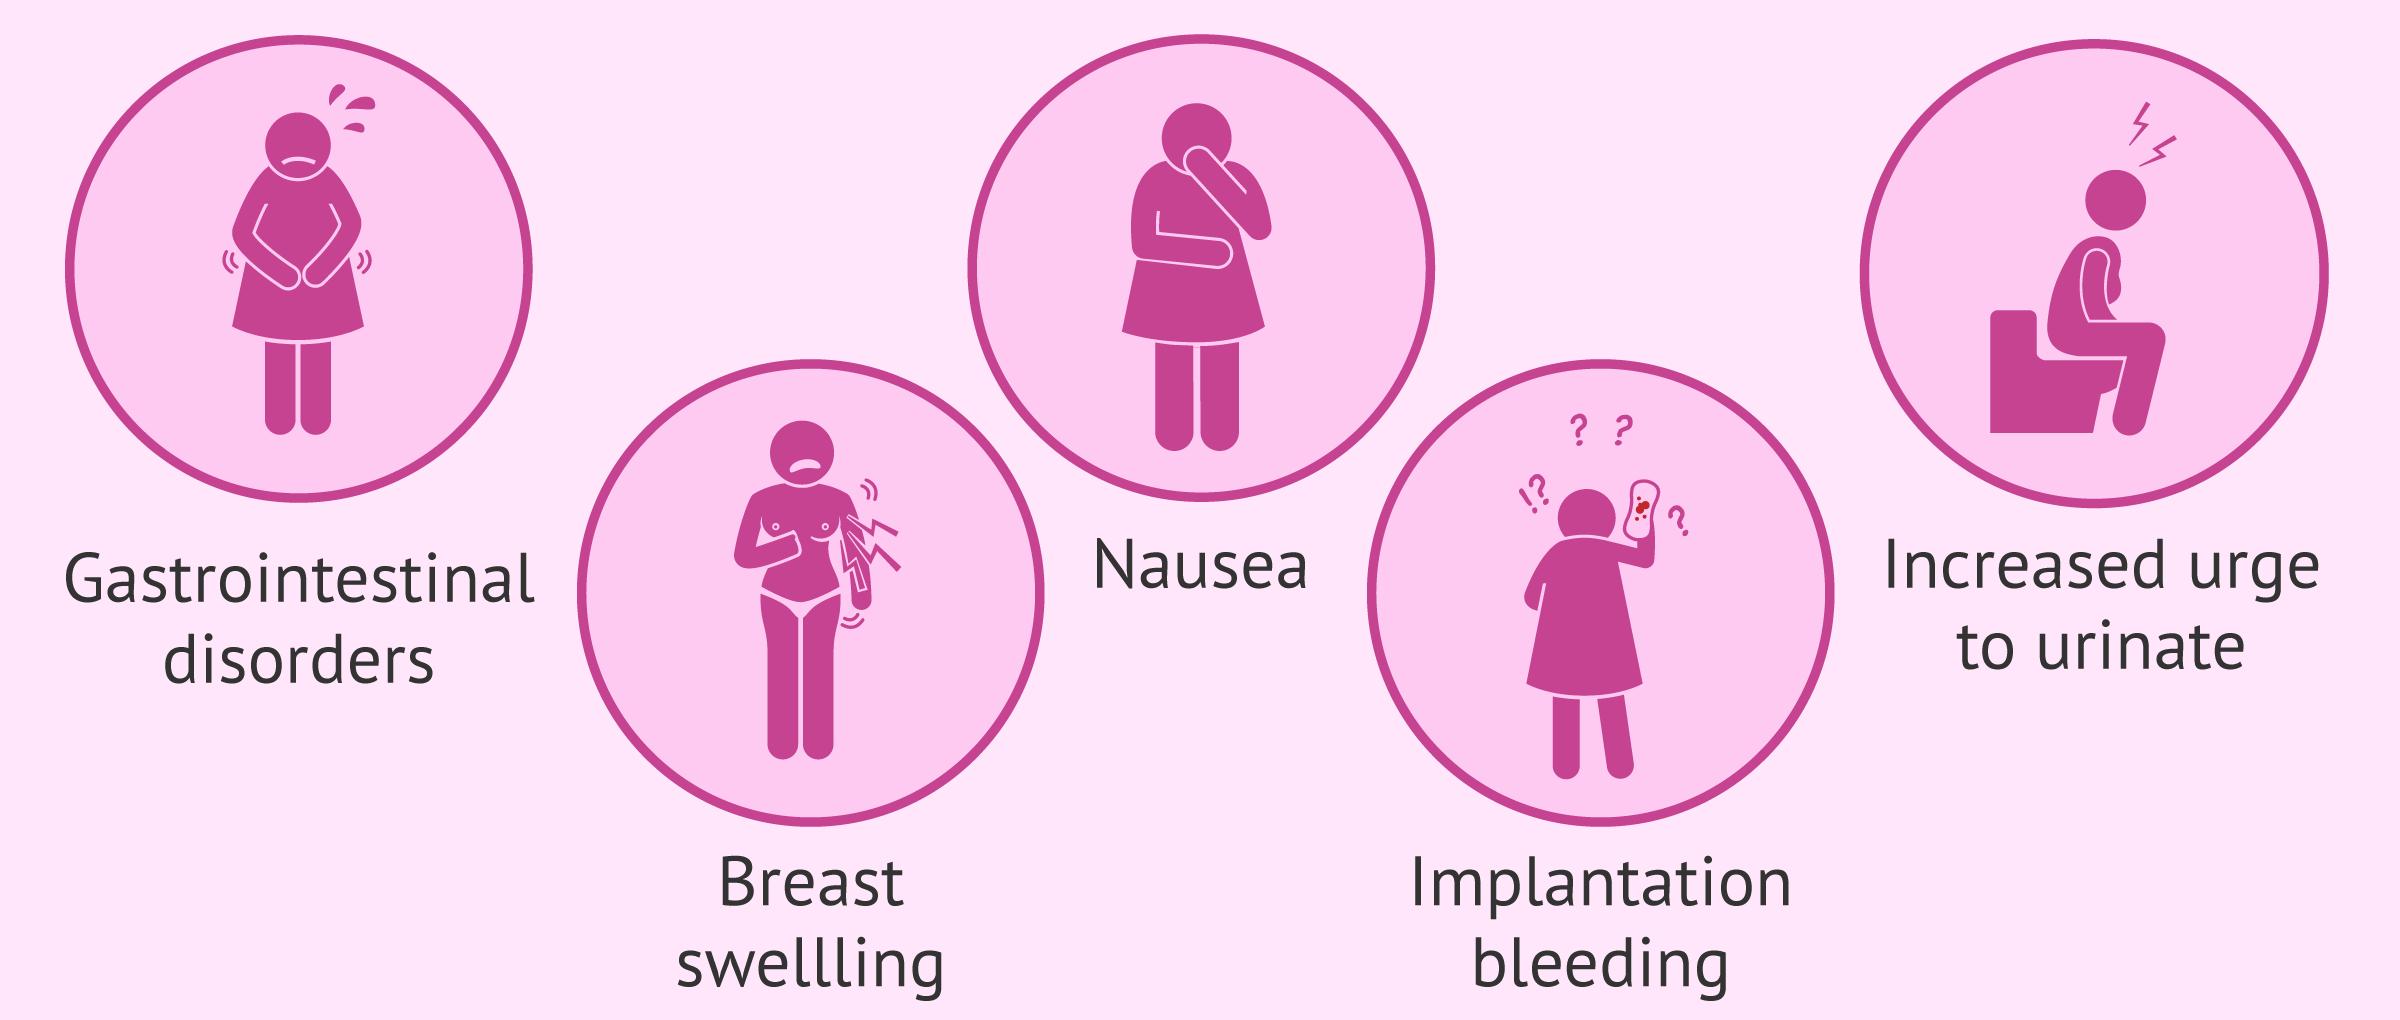 Main symptoms of embryo implantation